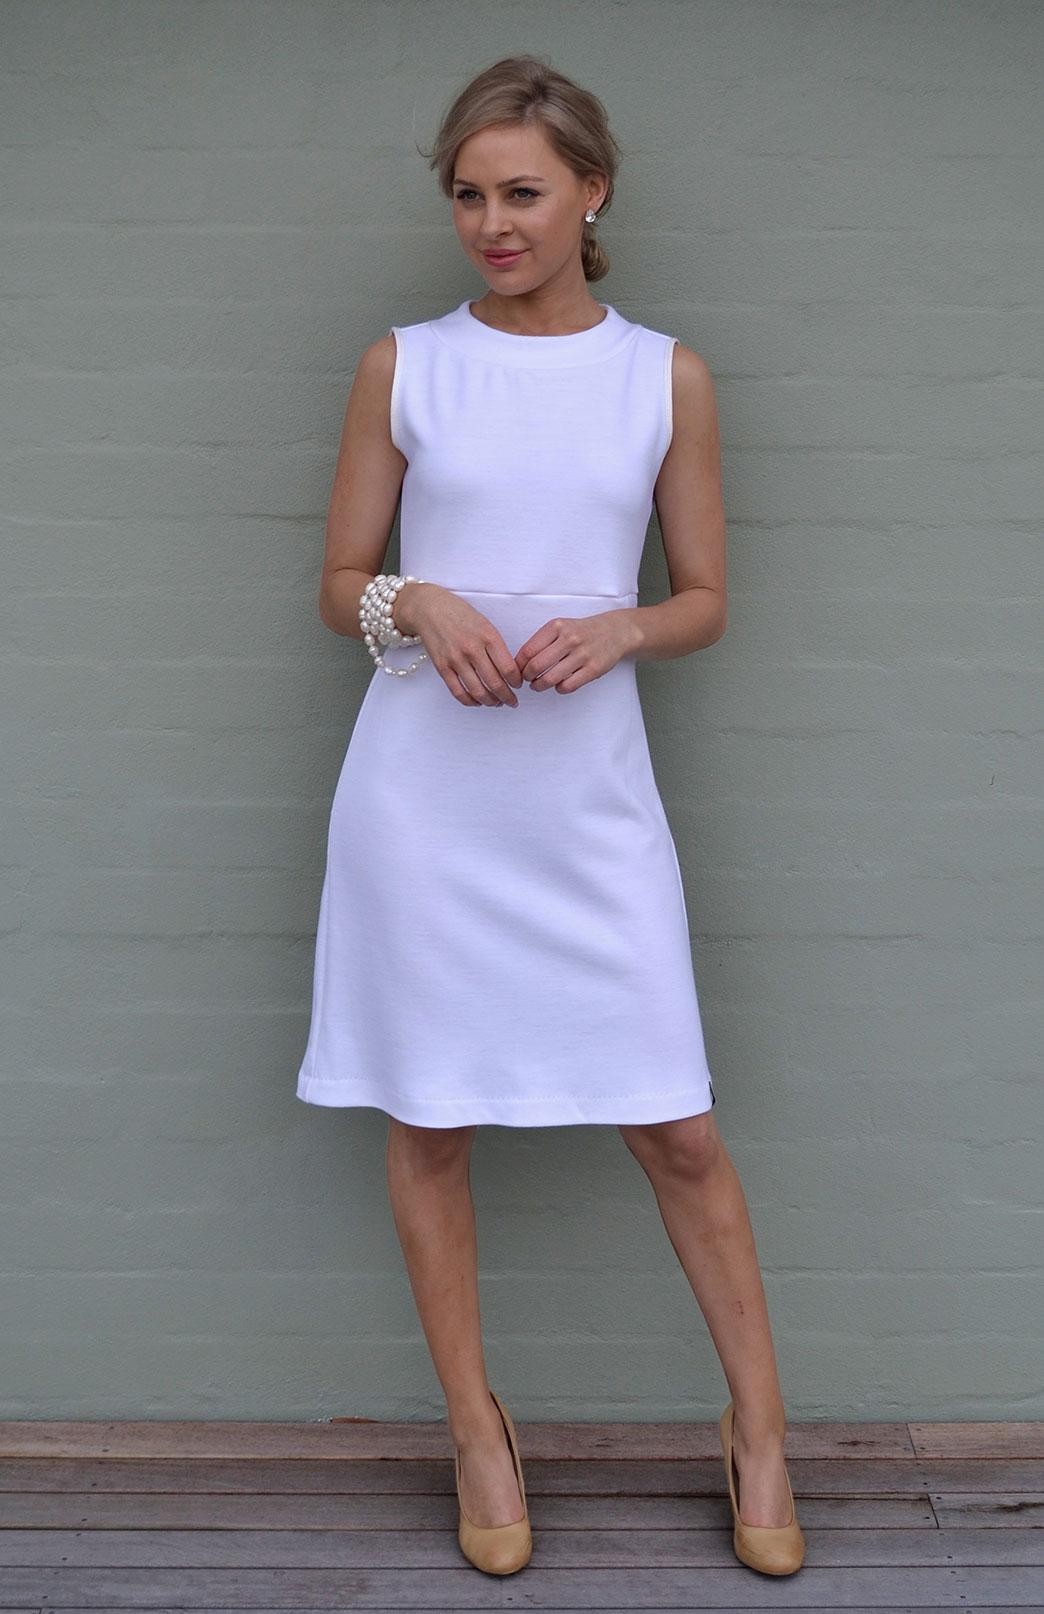 Asha Straight Dress - Women's Ivory Straight Wool Dress - Smitten Merino Tasmania Australia